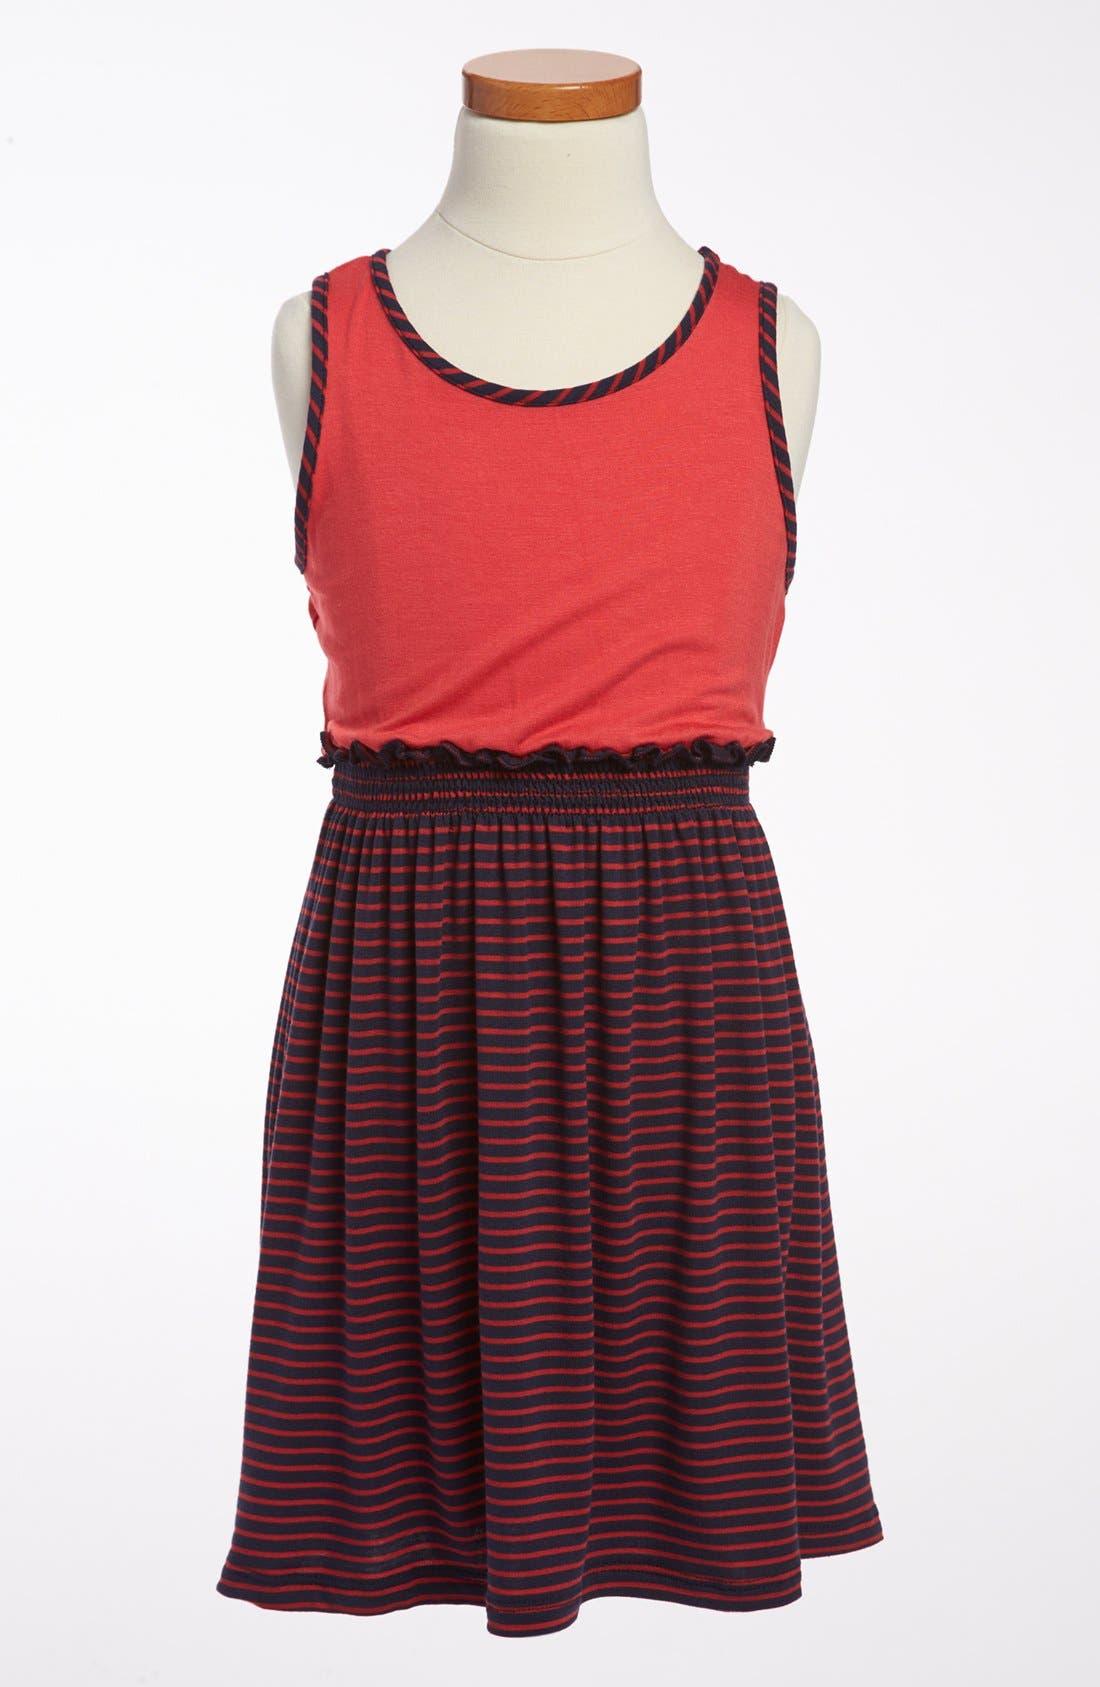 Alternate Image 1 Selected - Soprano Stripe Tank Dress (Little Girls & Big Girls)